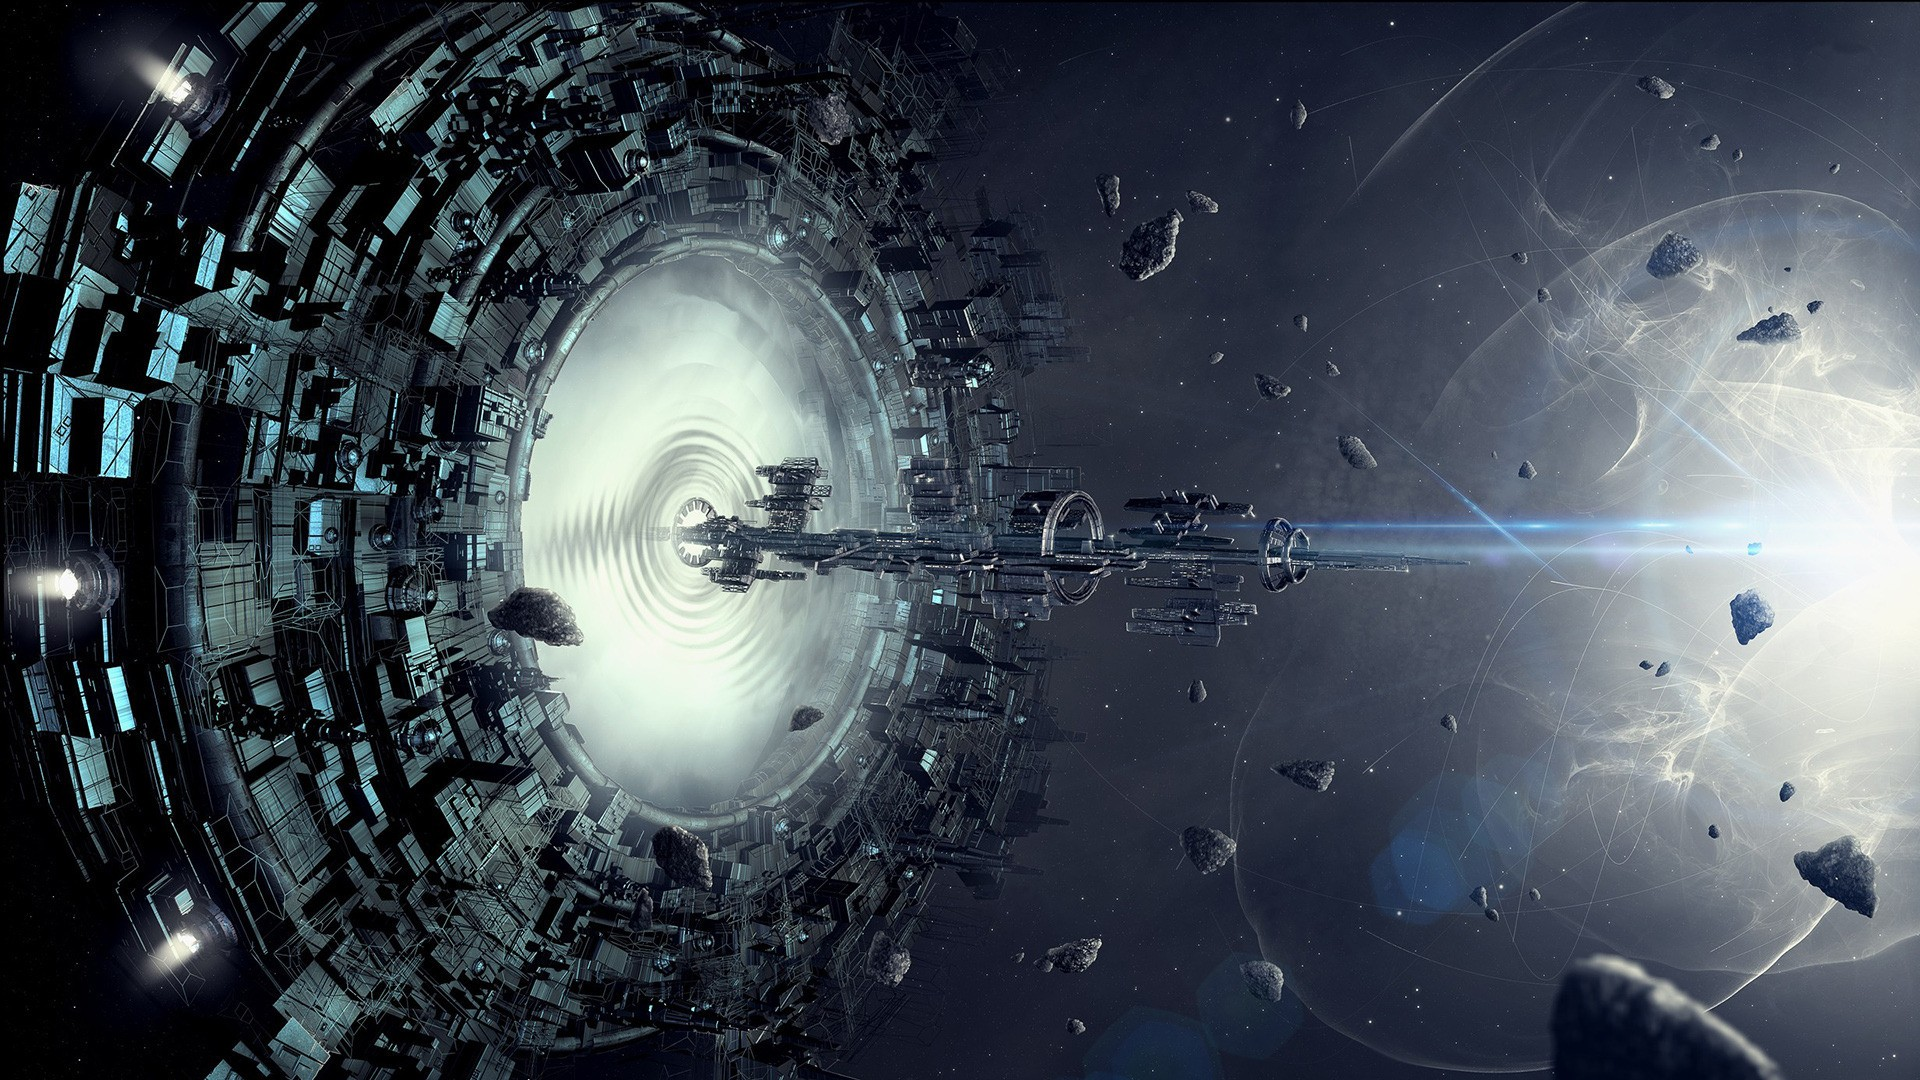 General 1920x1080 artwork fantasy art concept art spaceship stars space digital art